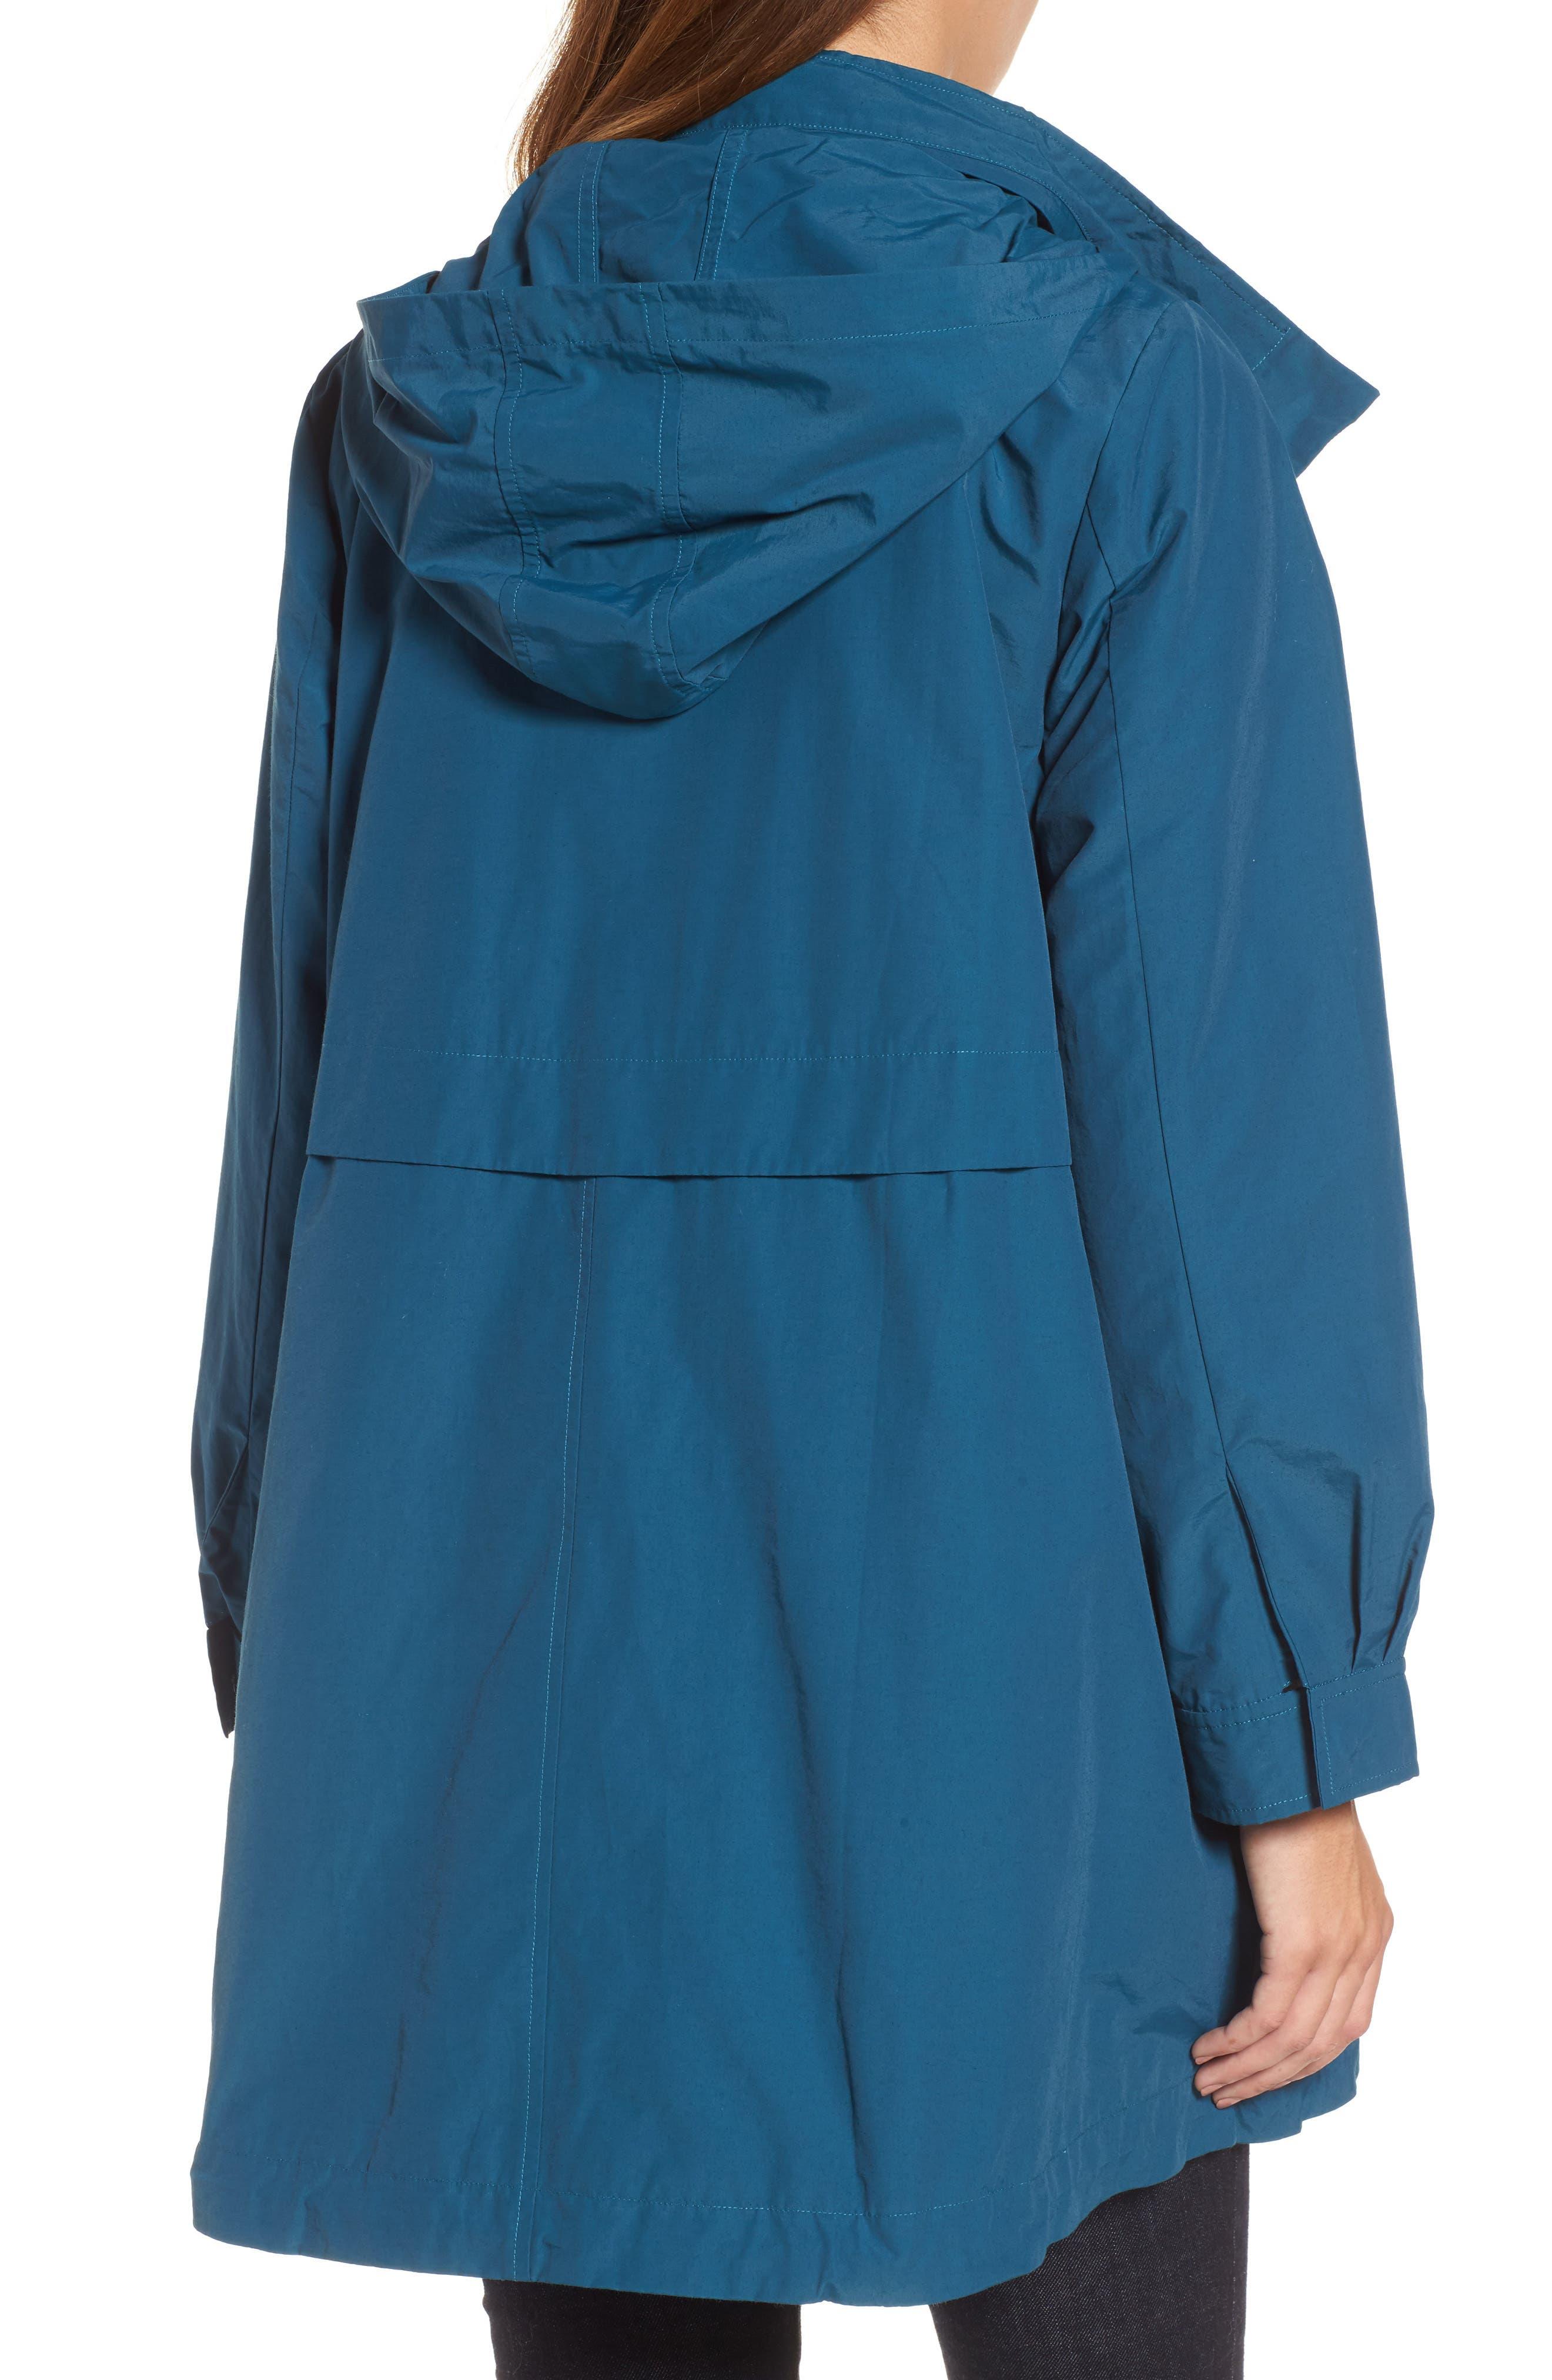 Hooded Utility Jacket,                             Alternate thumbnail 2, color,                             Blue Spruce